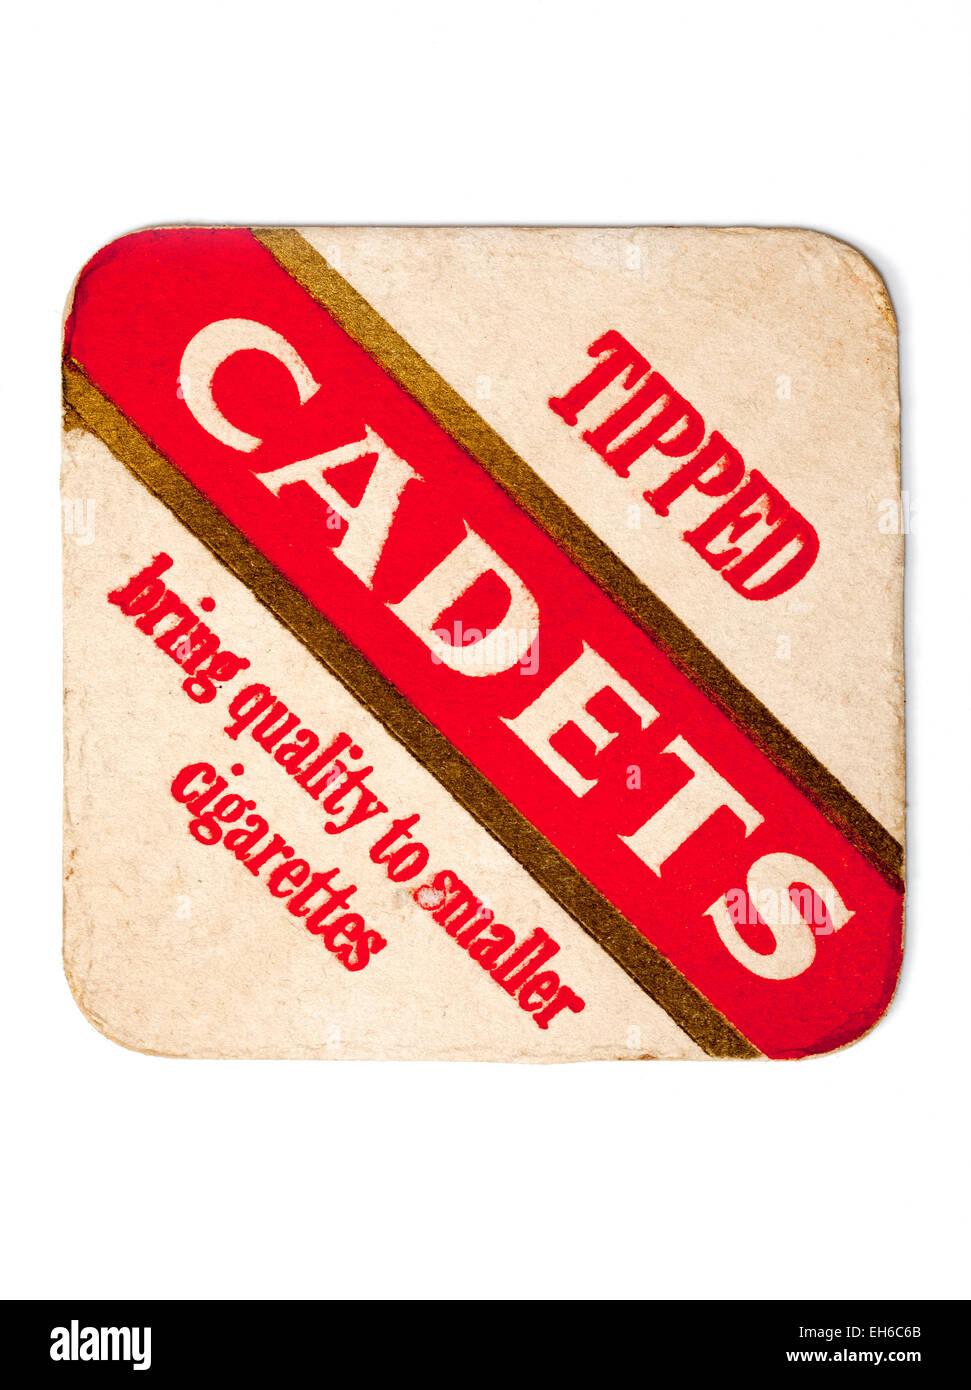 Vintage British Beermat Advertising Cadets Cigarettes - Stock Image